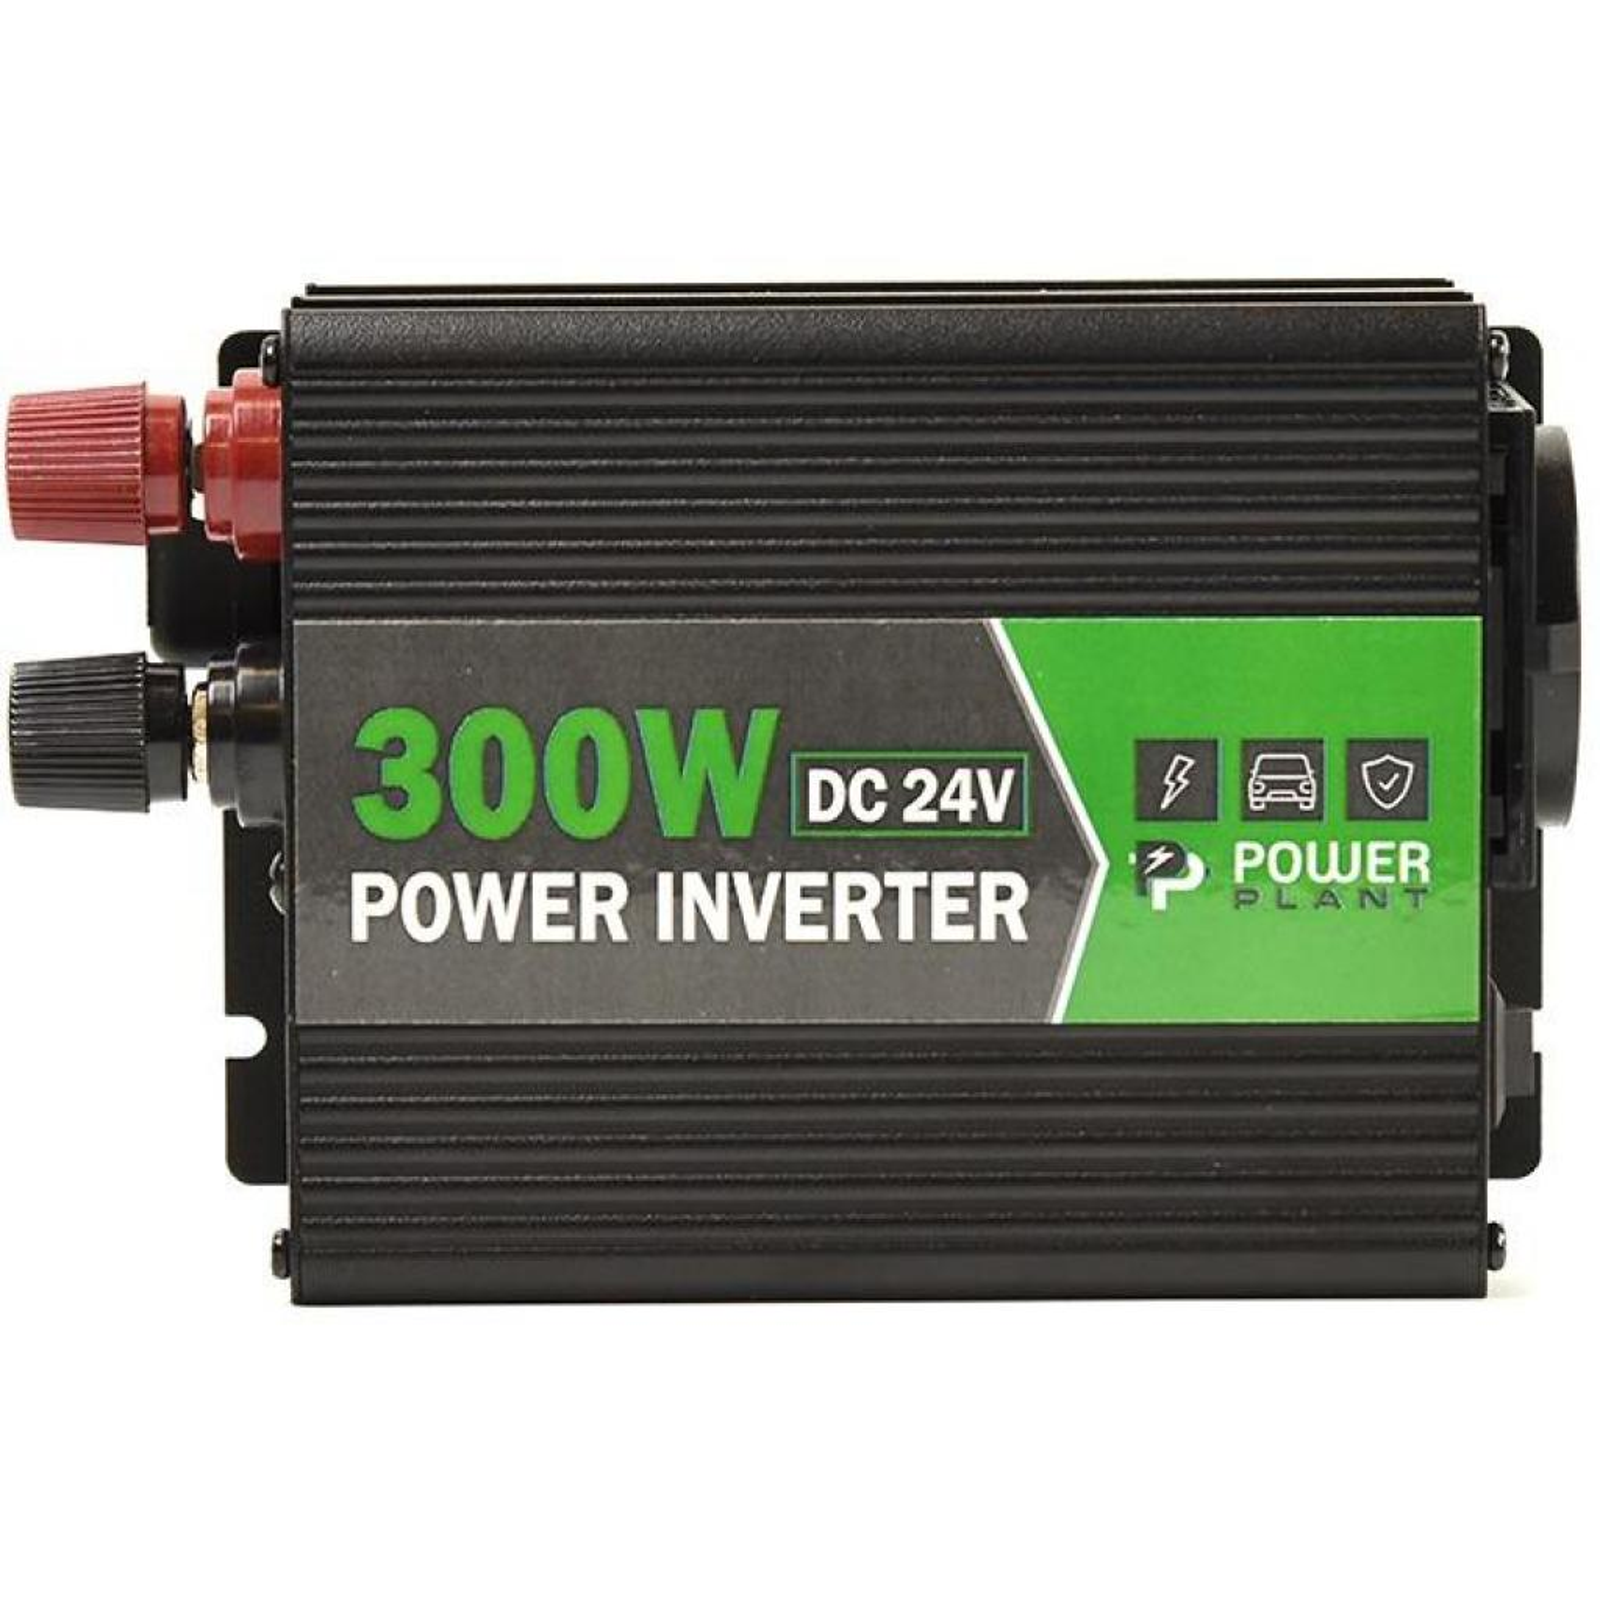 Автомобильный инвертор 24V/220V 300W, USB 5V 1A, HYM300-242 PowerPlant (KD00MS0002)